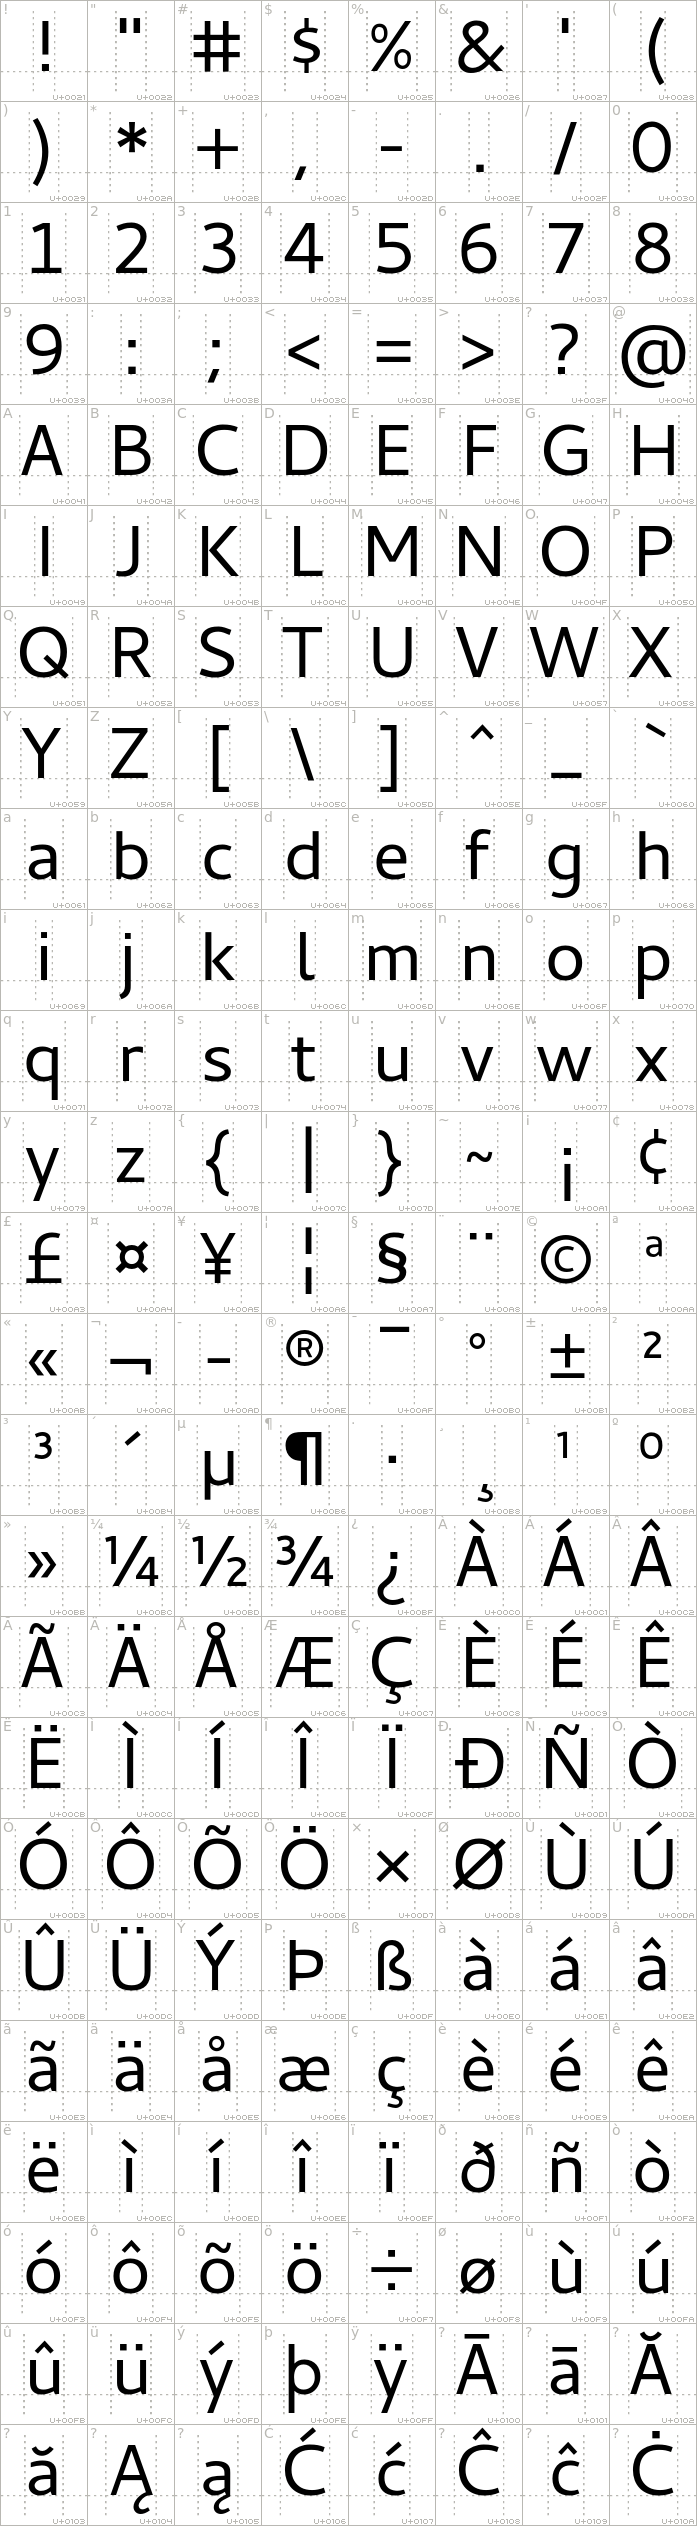 cantarell.regular.character-map-1